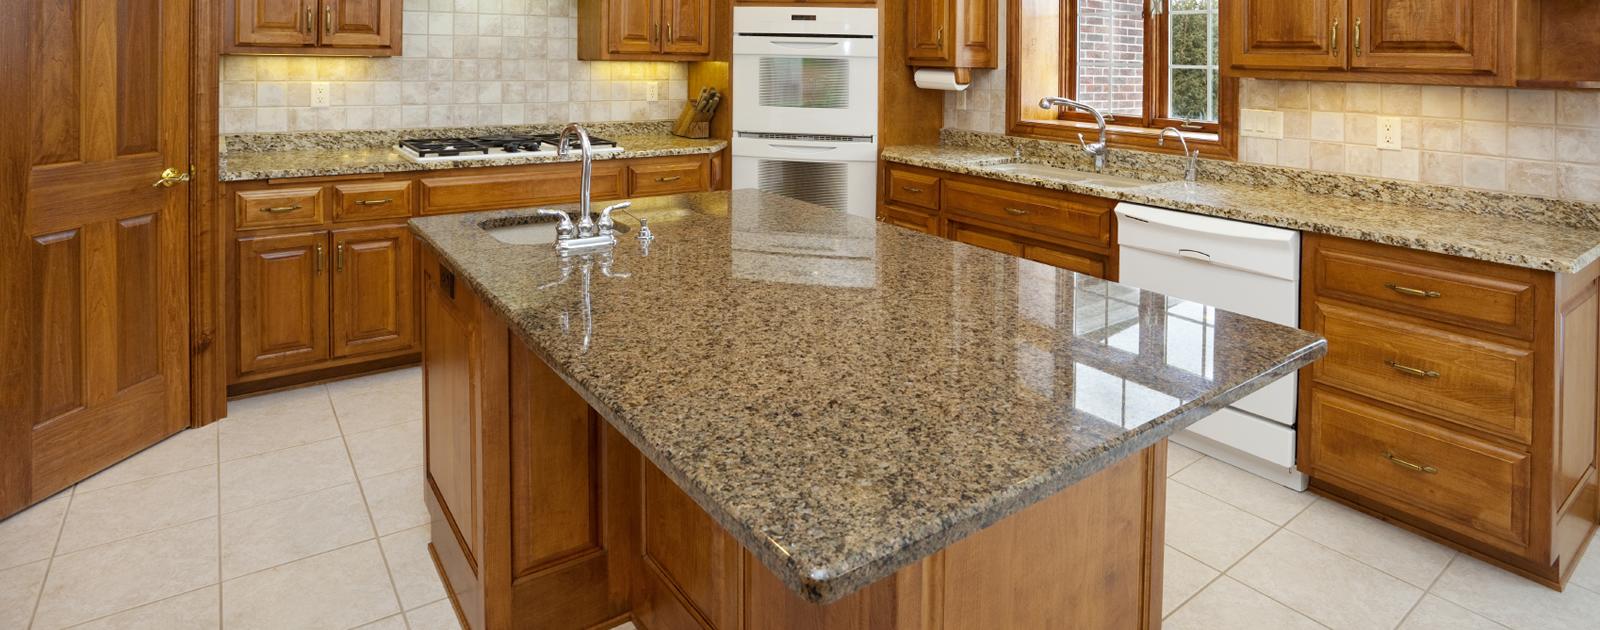 comparing natural stone countertops kitchen countertop materials granite countertop